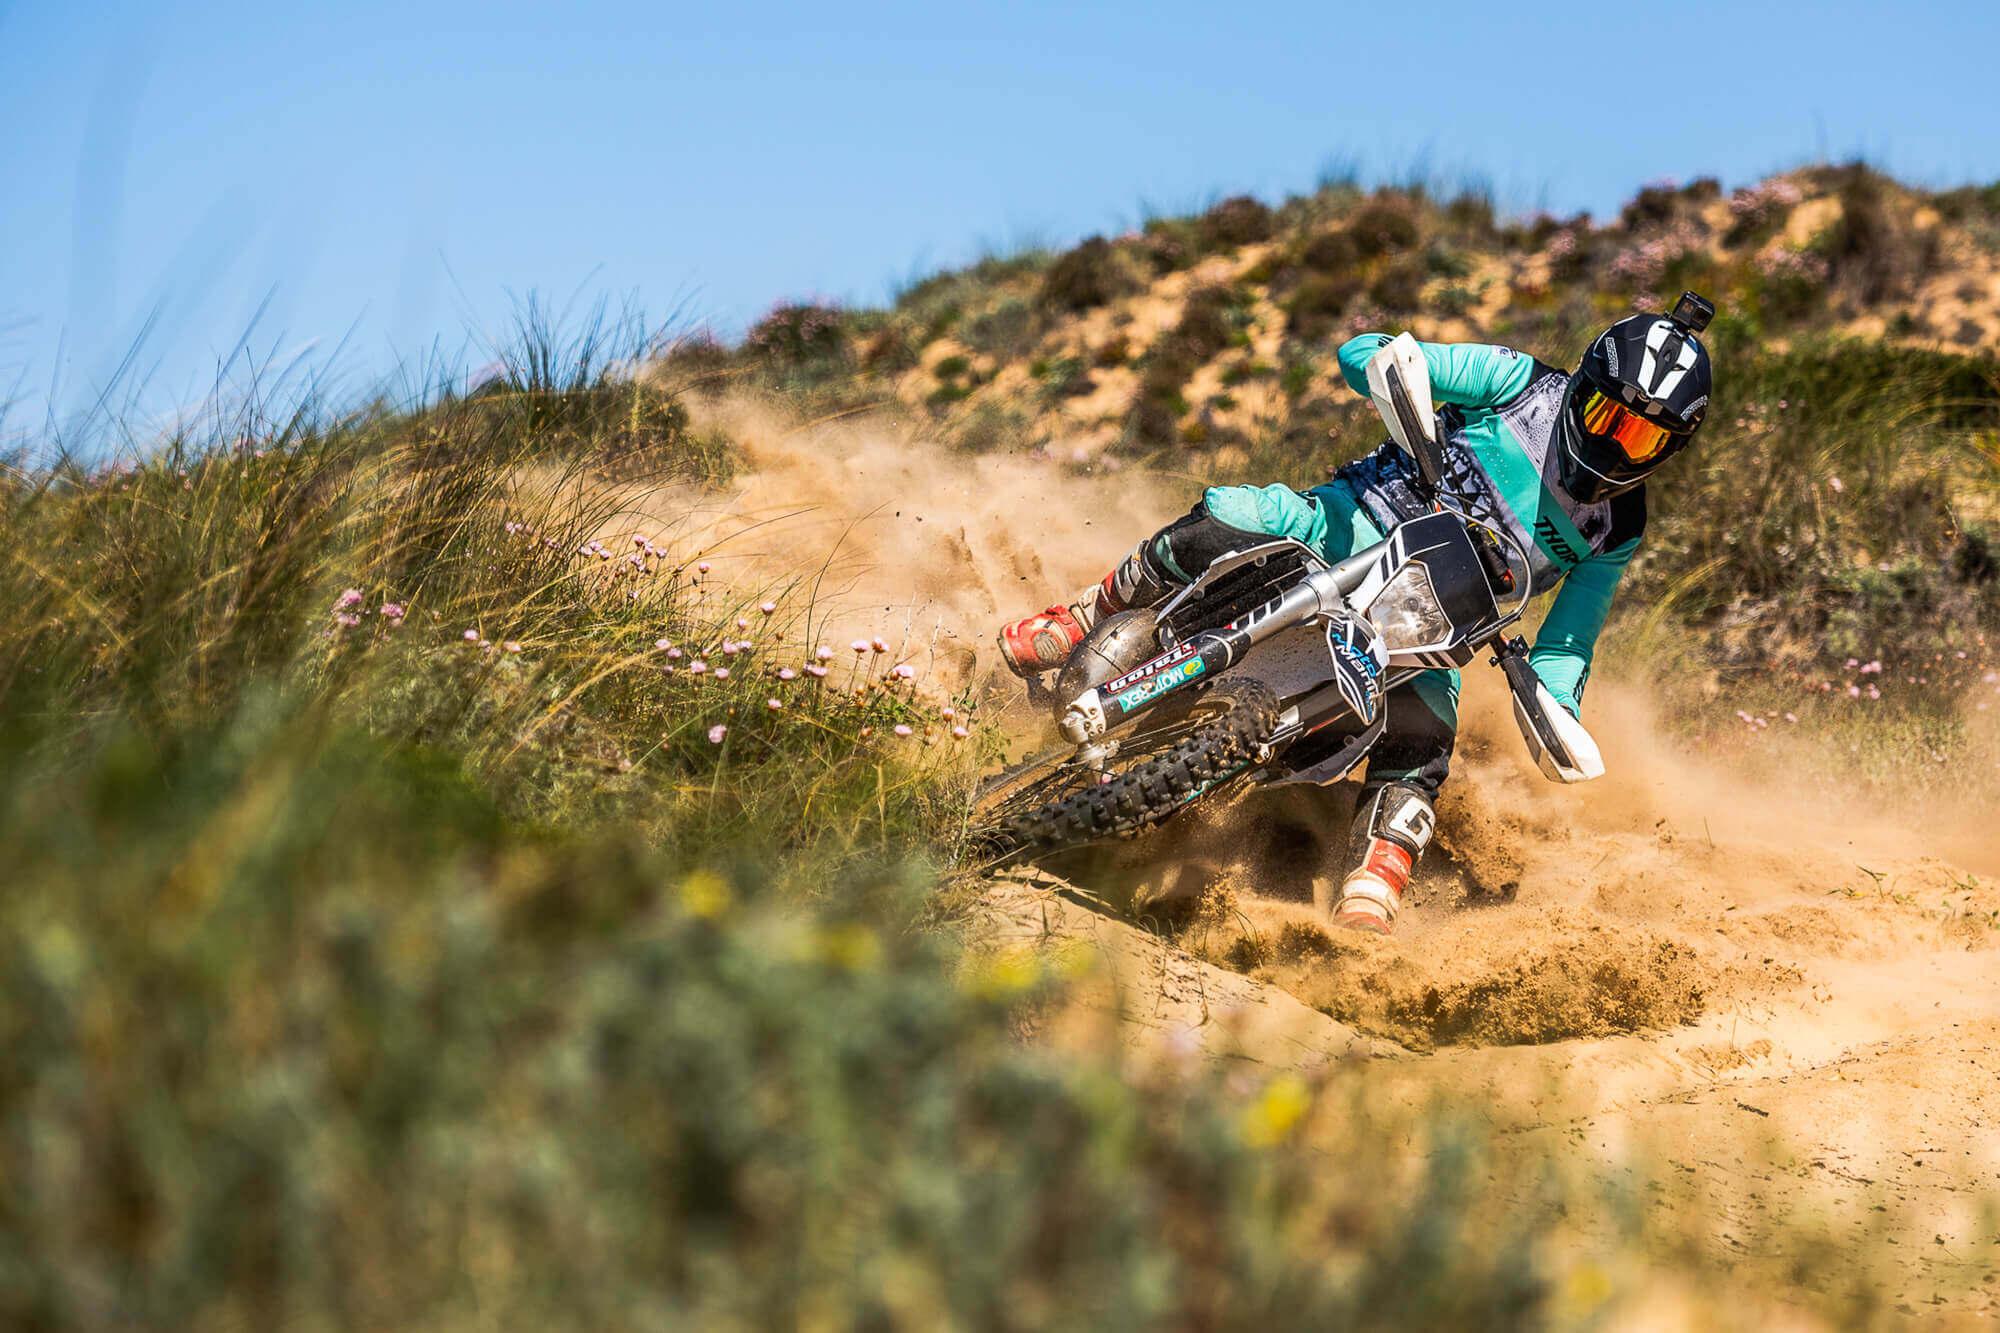 Motocross Profi Sebastian Wolter in Action